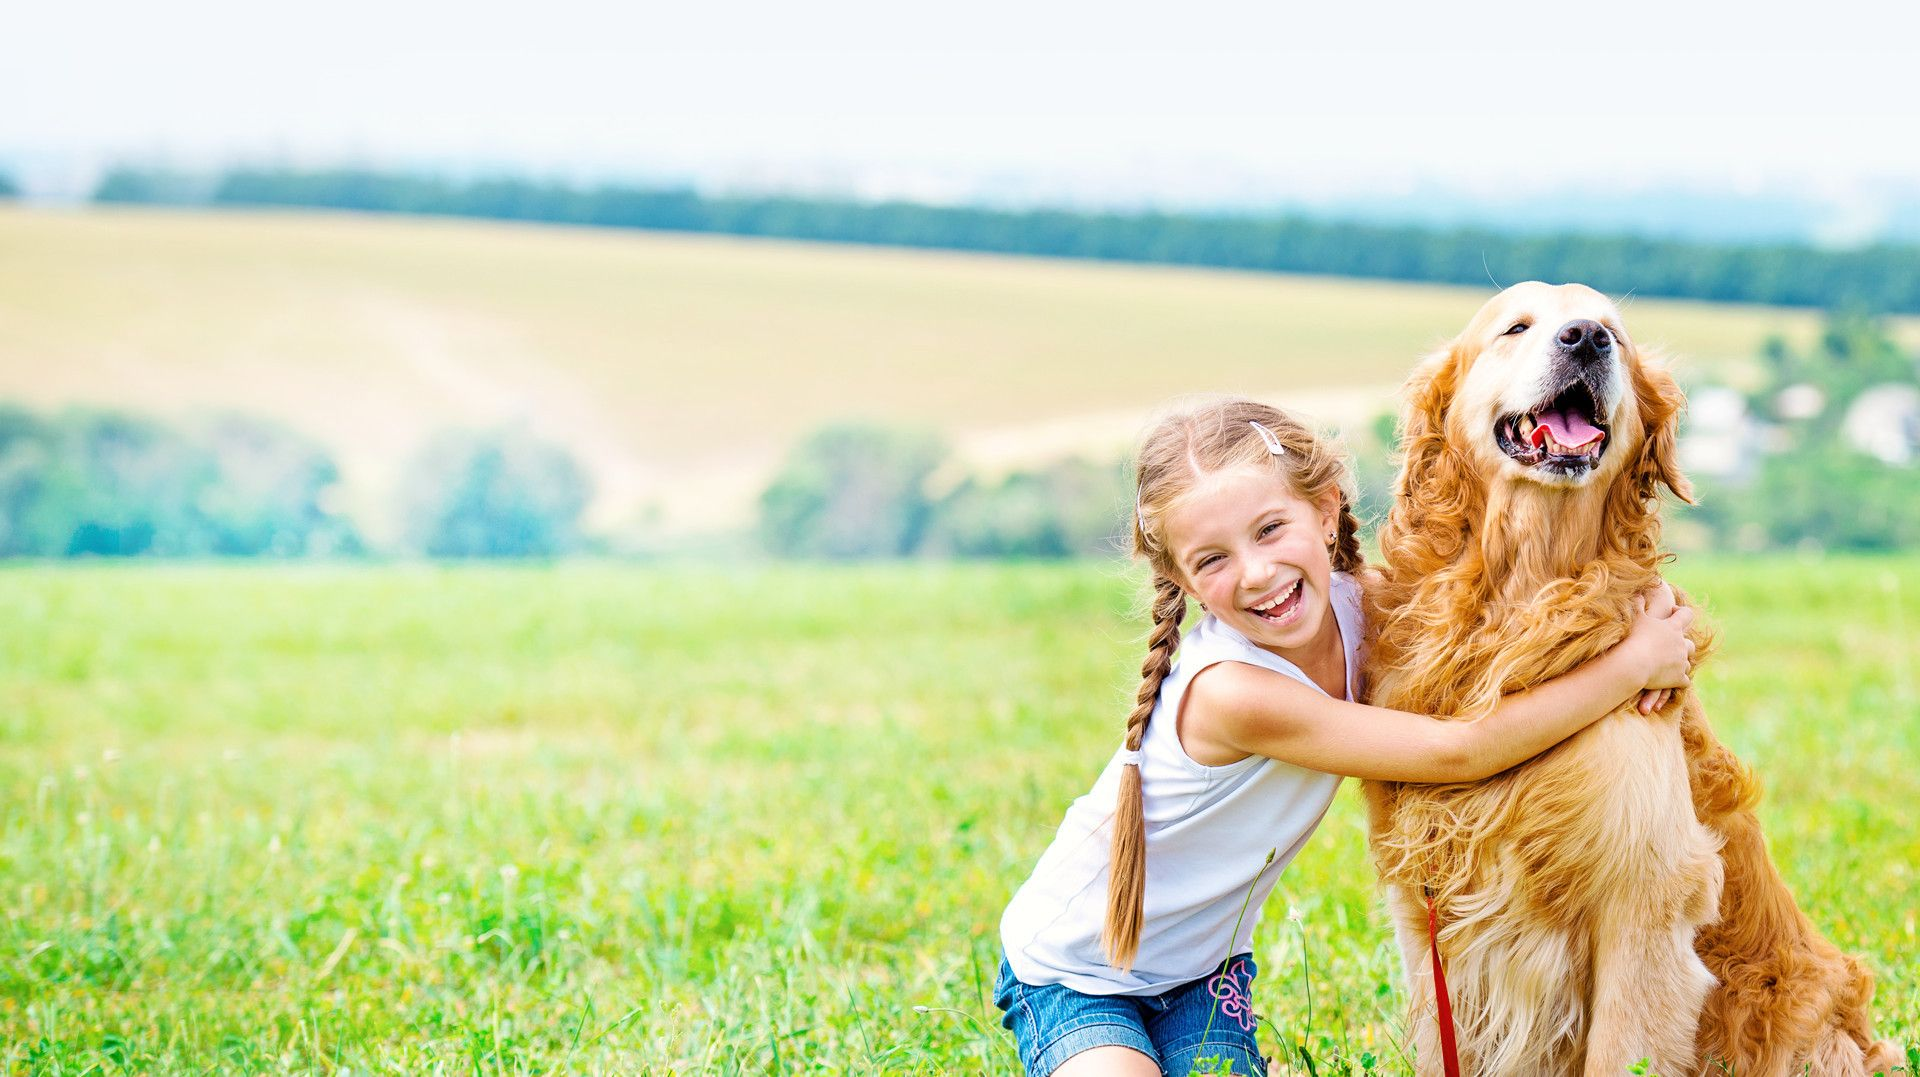 girl hugging a dog